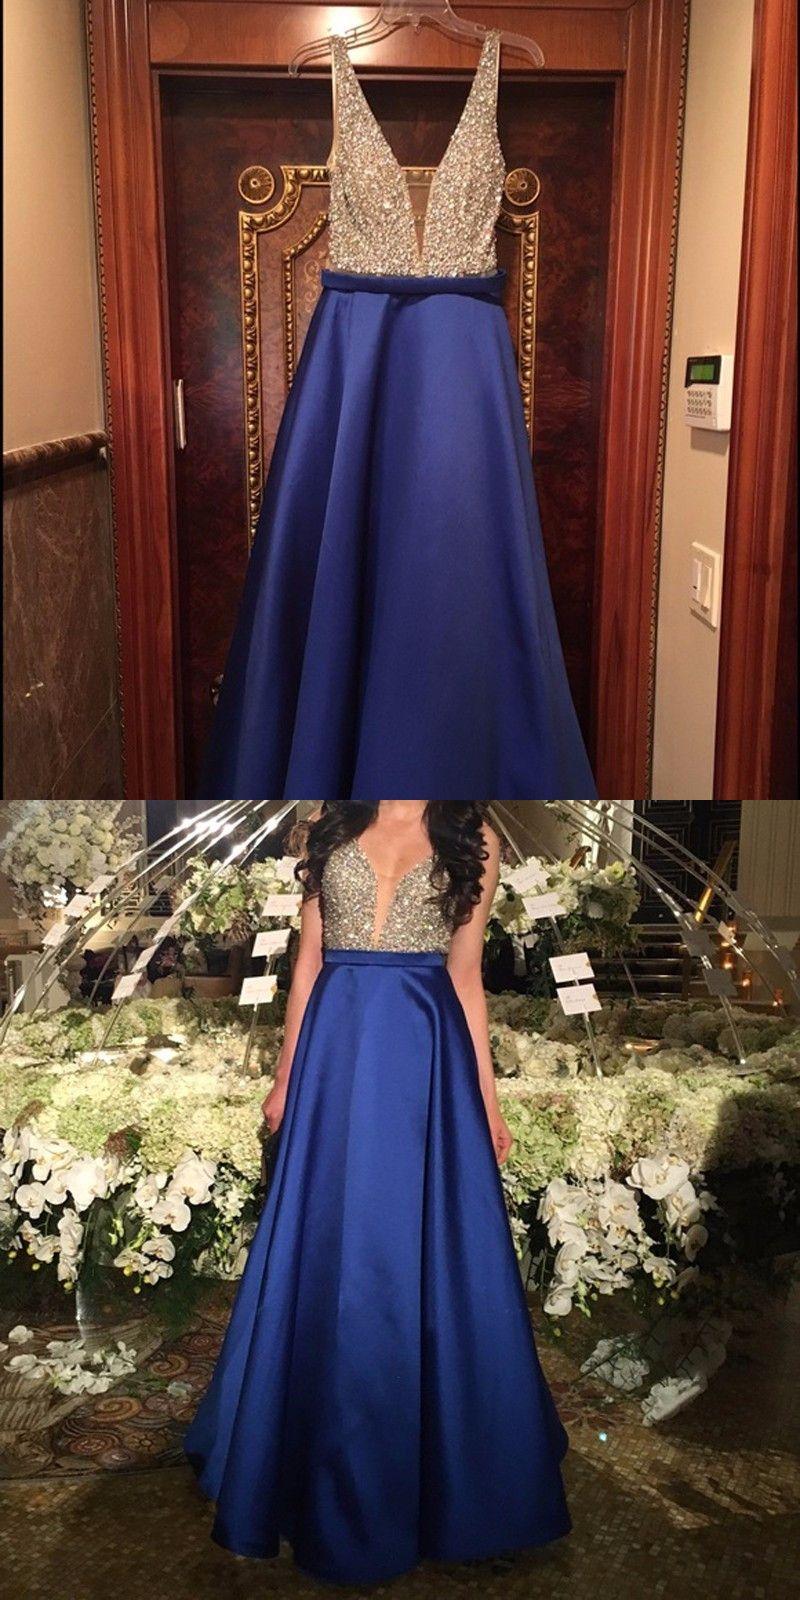 New Arrival Prom Dress A Line Prom Dress Elegant Evening Dress Sleeveless Evening Dresses Formal Gown Evening Dress Beaded Evening Dress Sleeveless A Line Prom Dresses